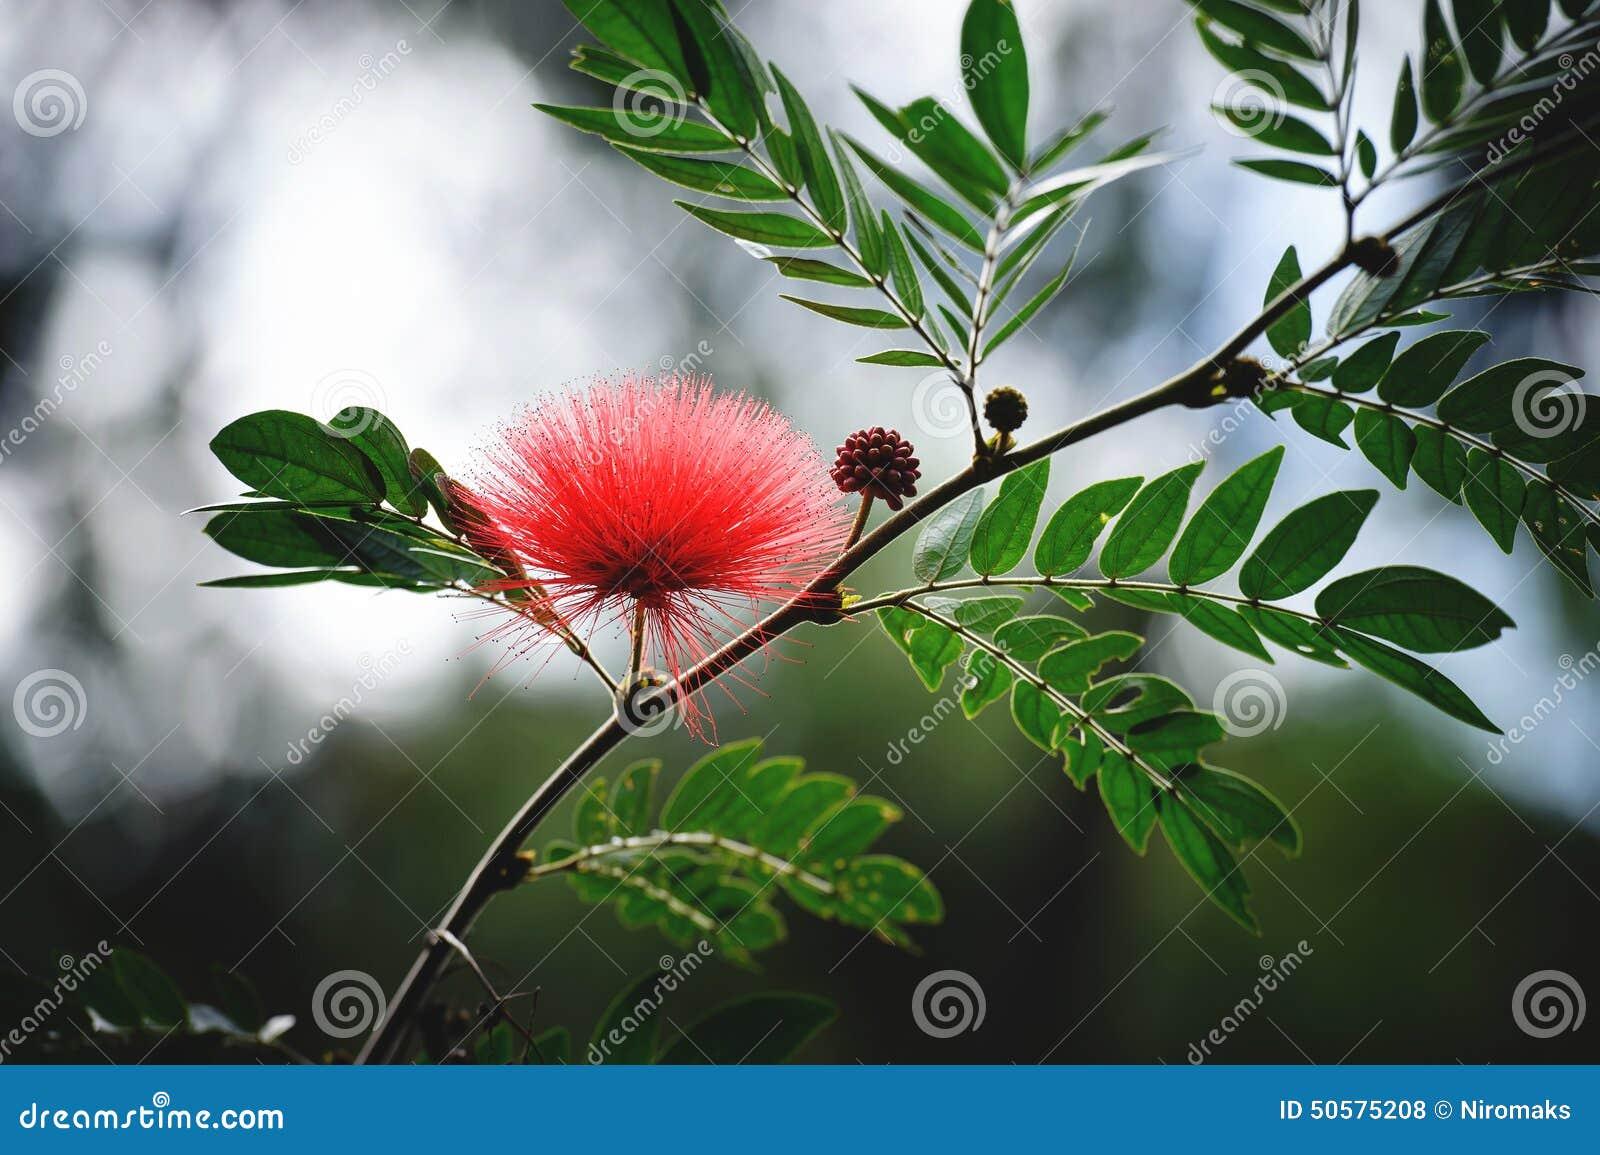 Persian Silk Tree Flower Stock Photo Image Of Decoration 50575208